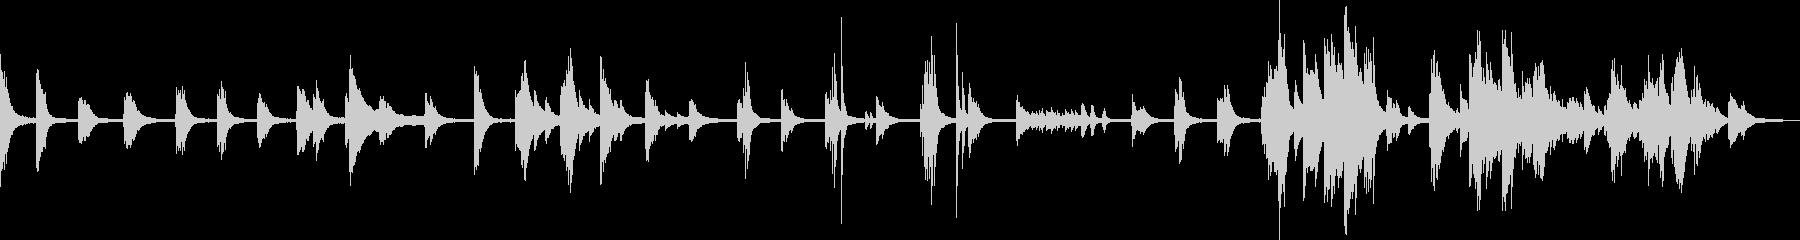 A sad piano piece full of despair and loss's unreproduced waveform